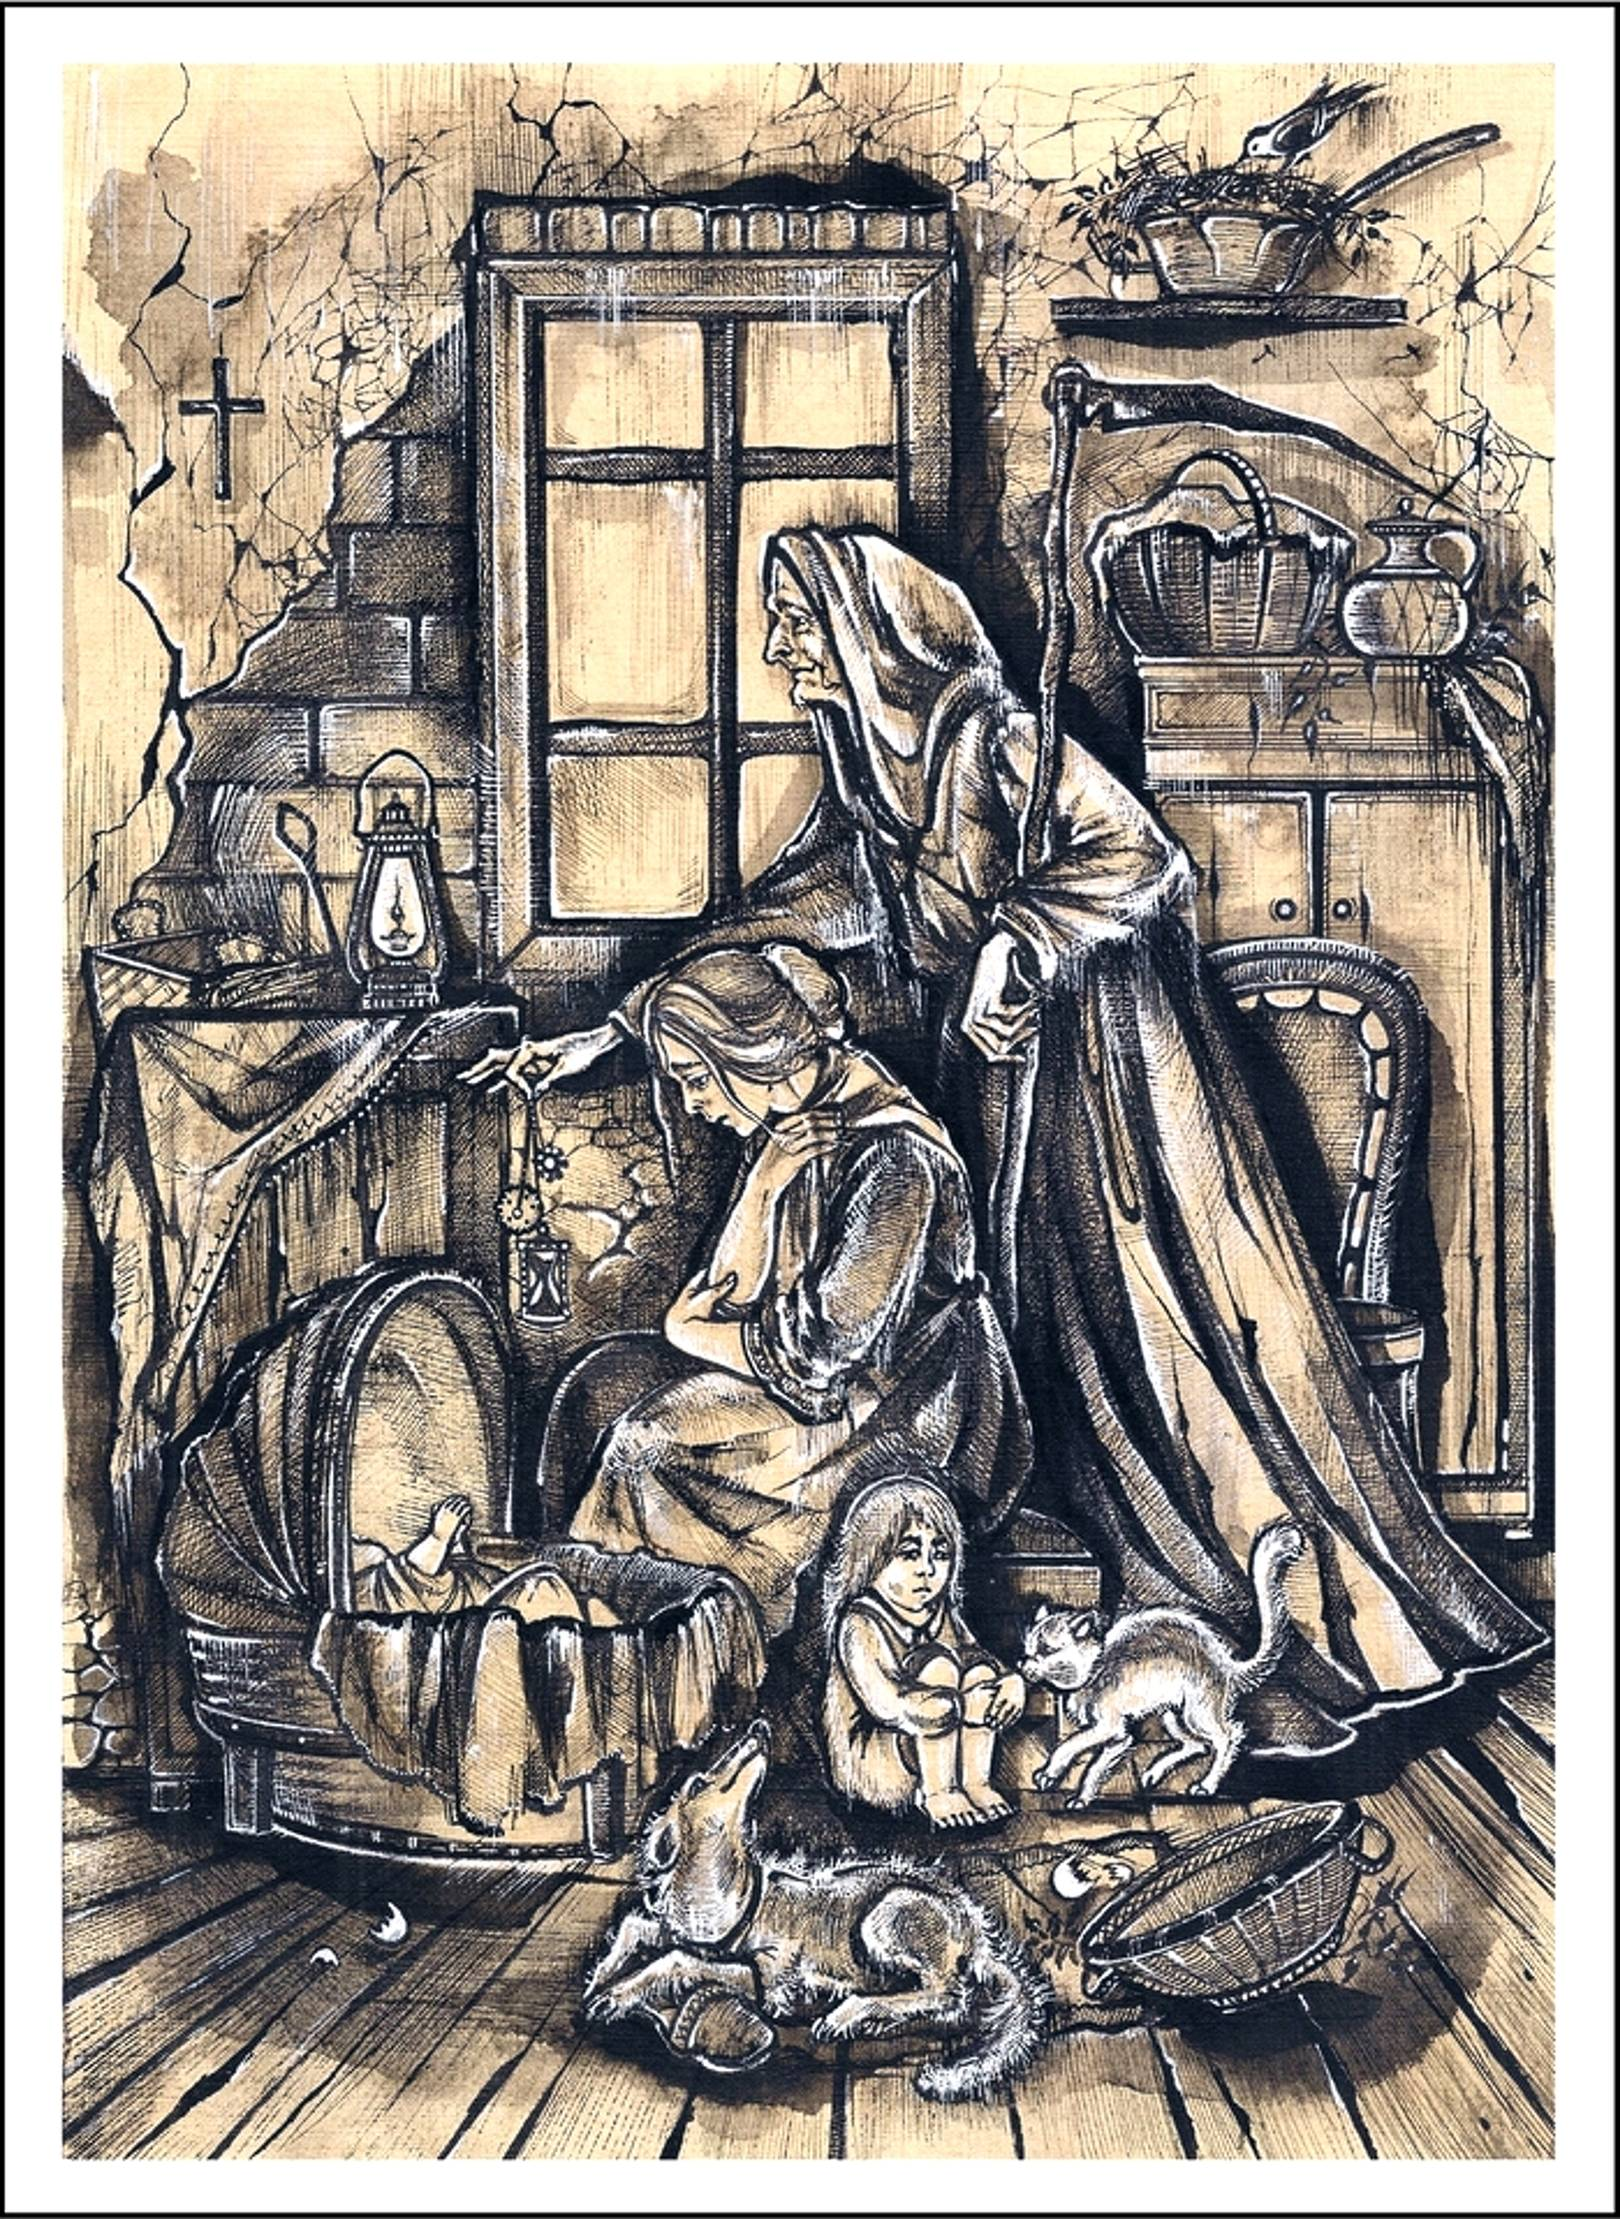 Песни и пляски смерти» — цикл песен М. П. Мусоргского на стихи А. А. Голенищева-Кутузова